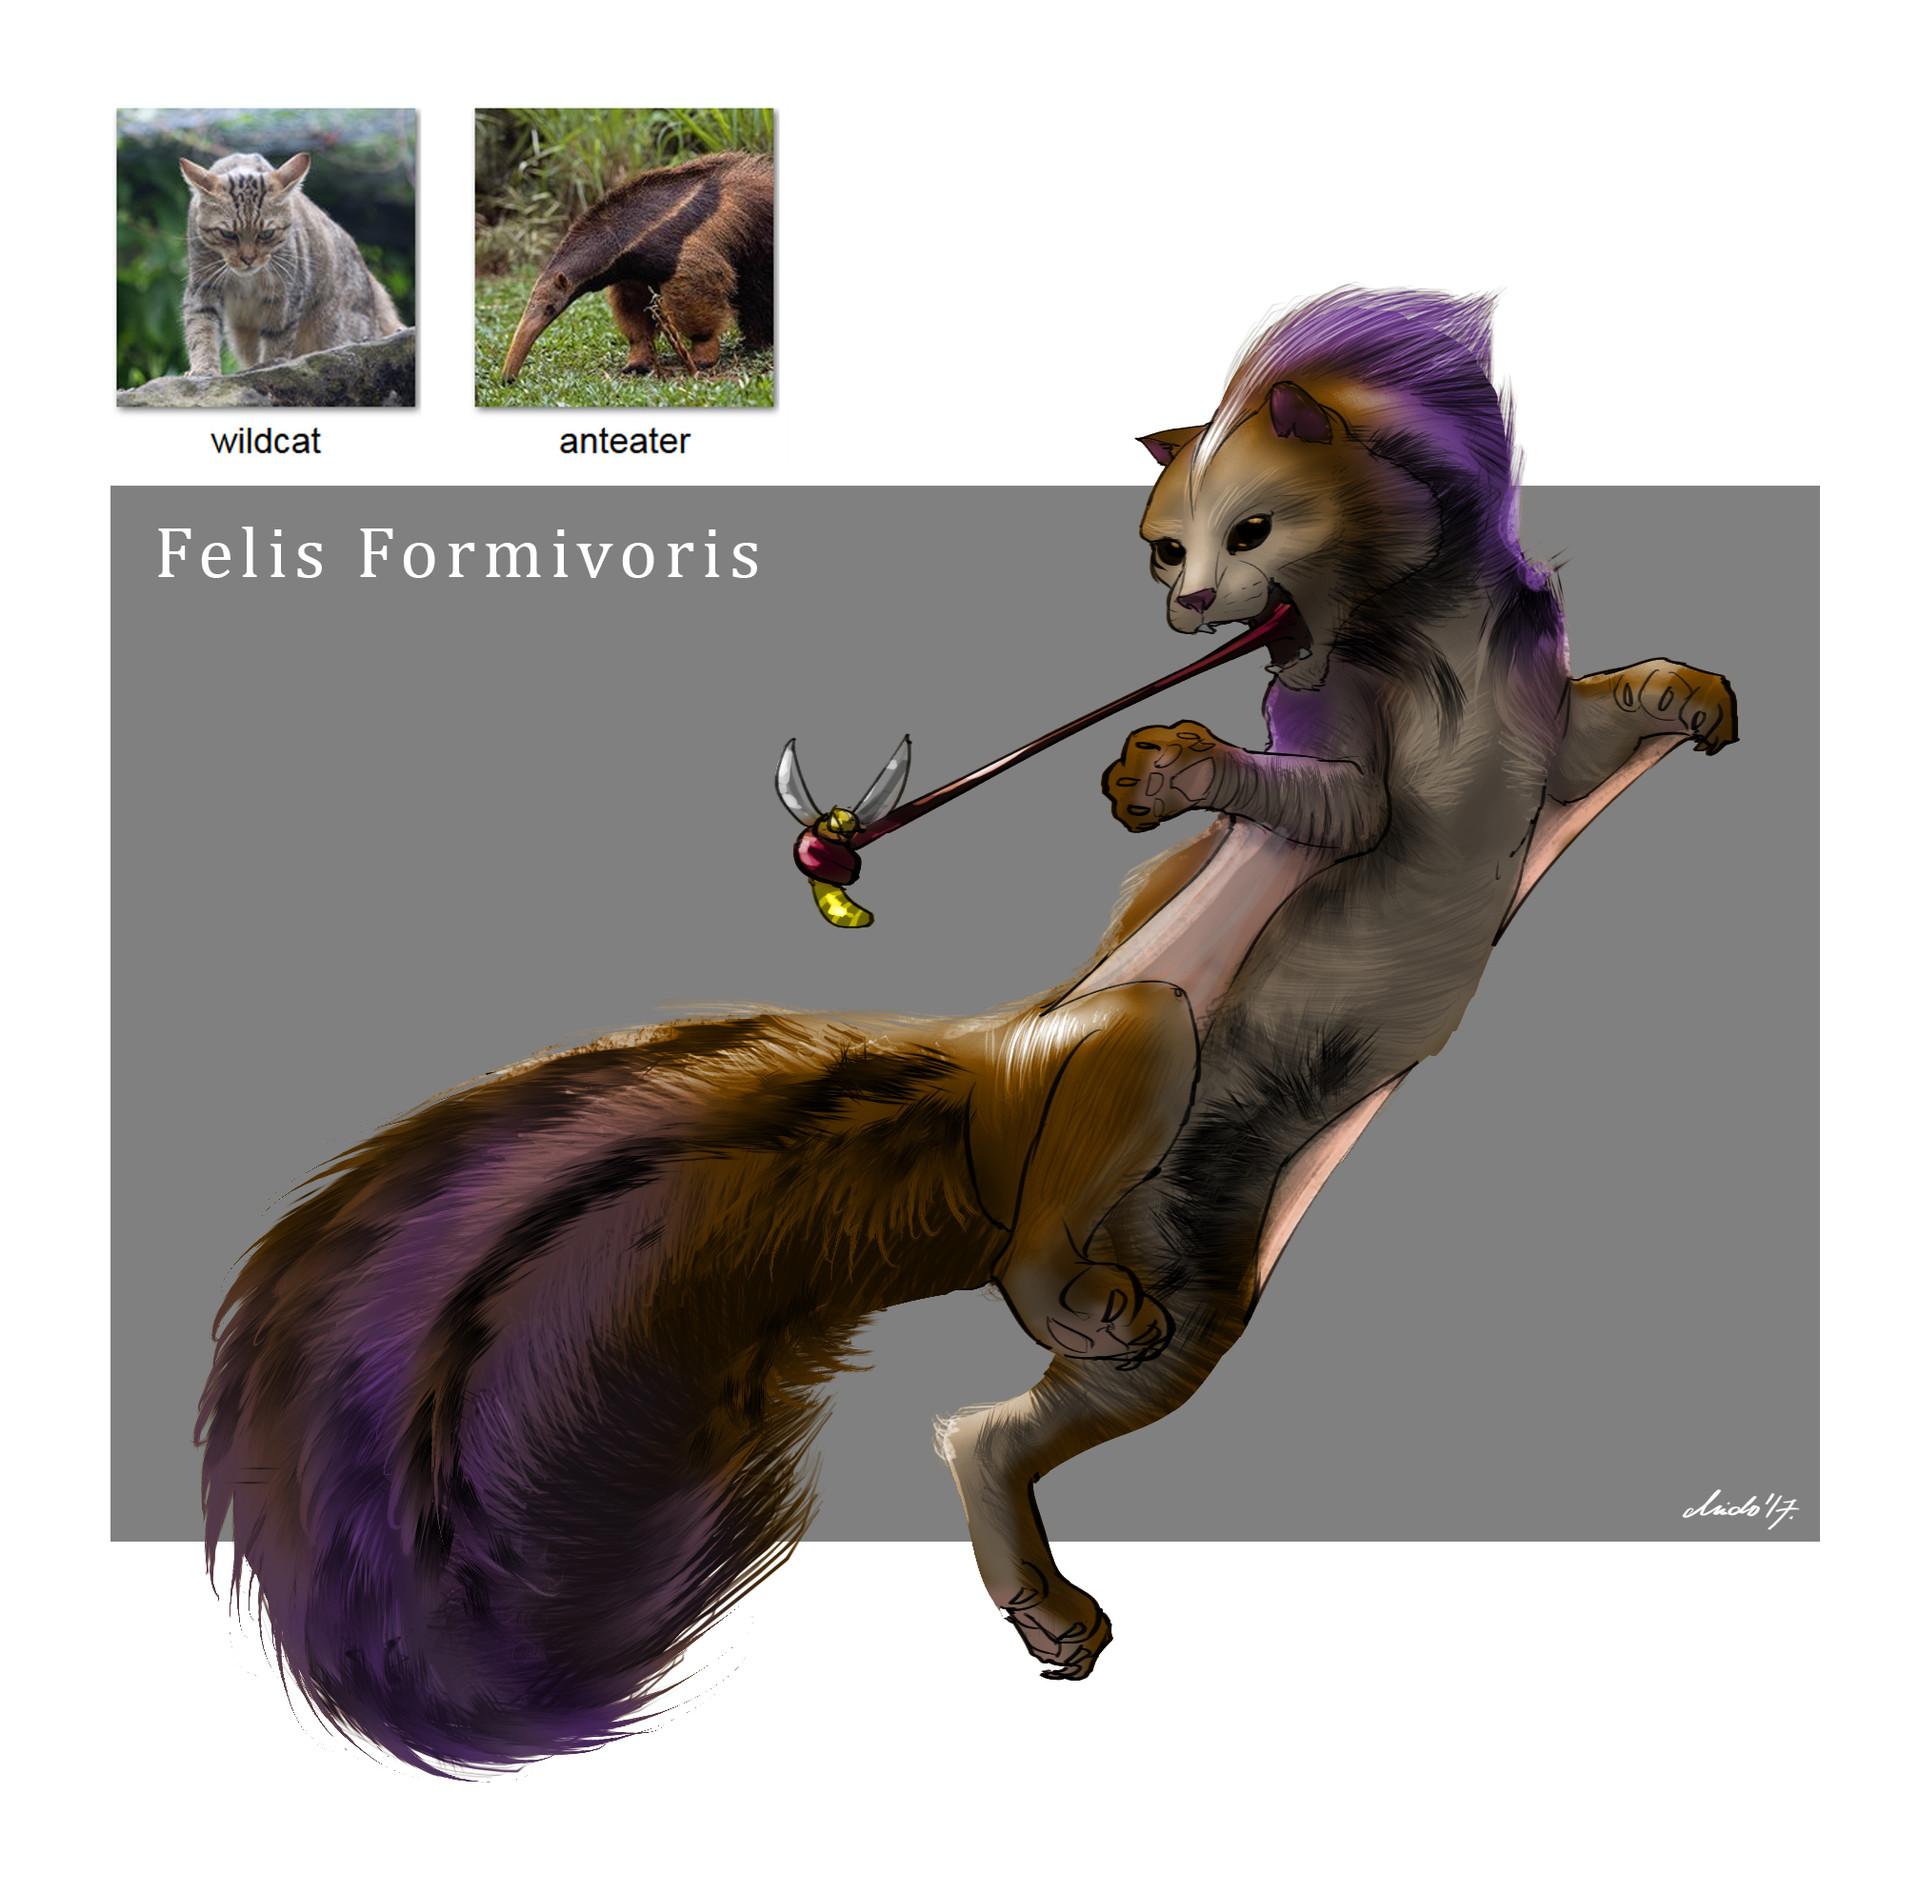 Midhat kapetanovic random creature mashup 007 felis formivoris